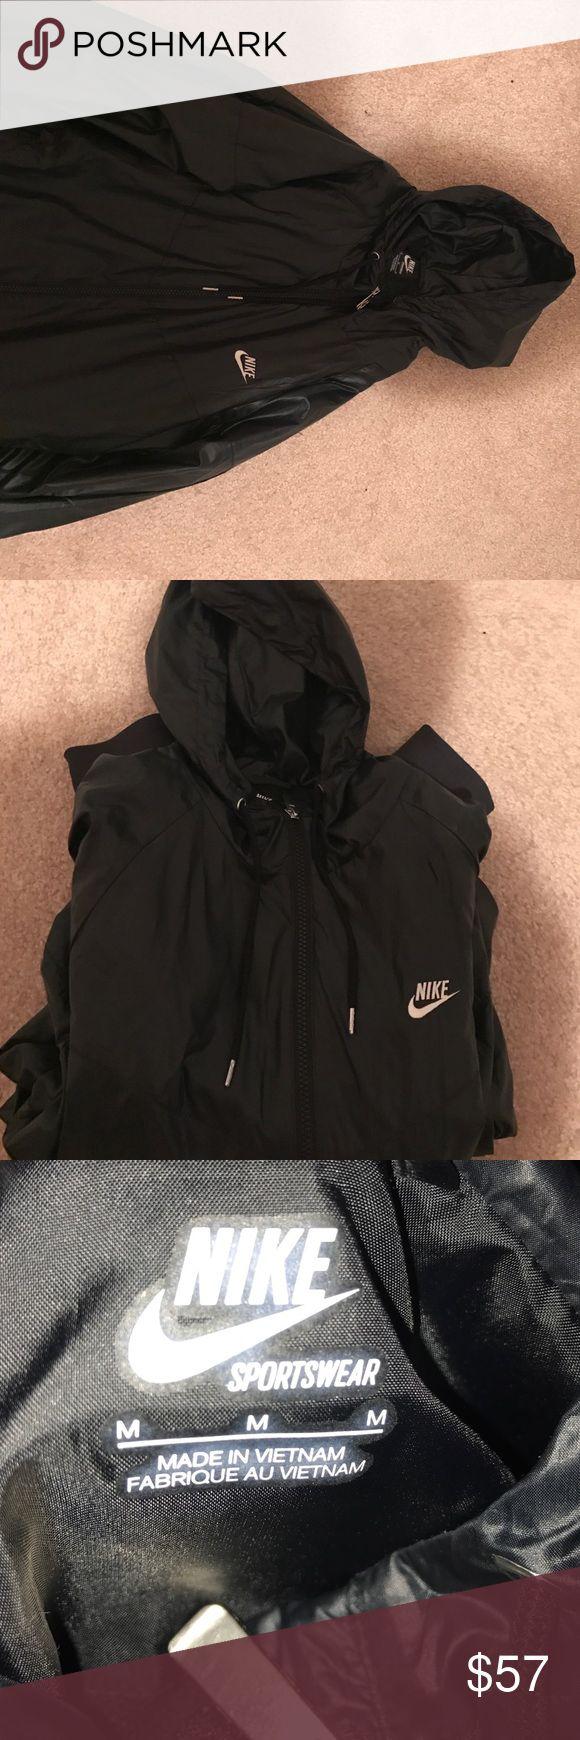 Waterproof Nike jacket EUC Black waterproof Nike jacket. Size M. The jacket has barely been worn. lululemon athletica Jackets & Coats